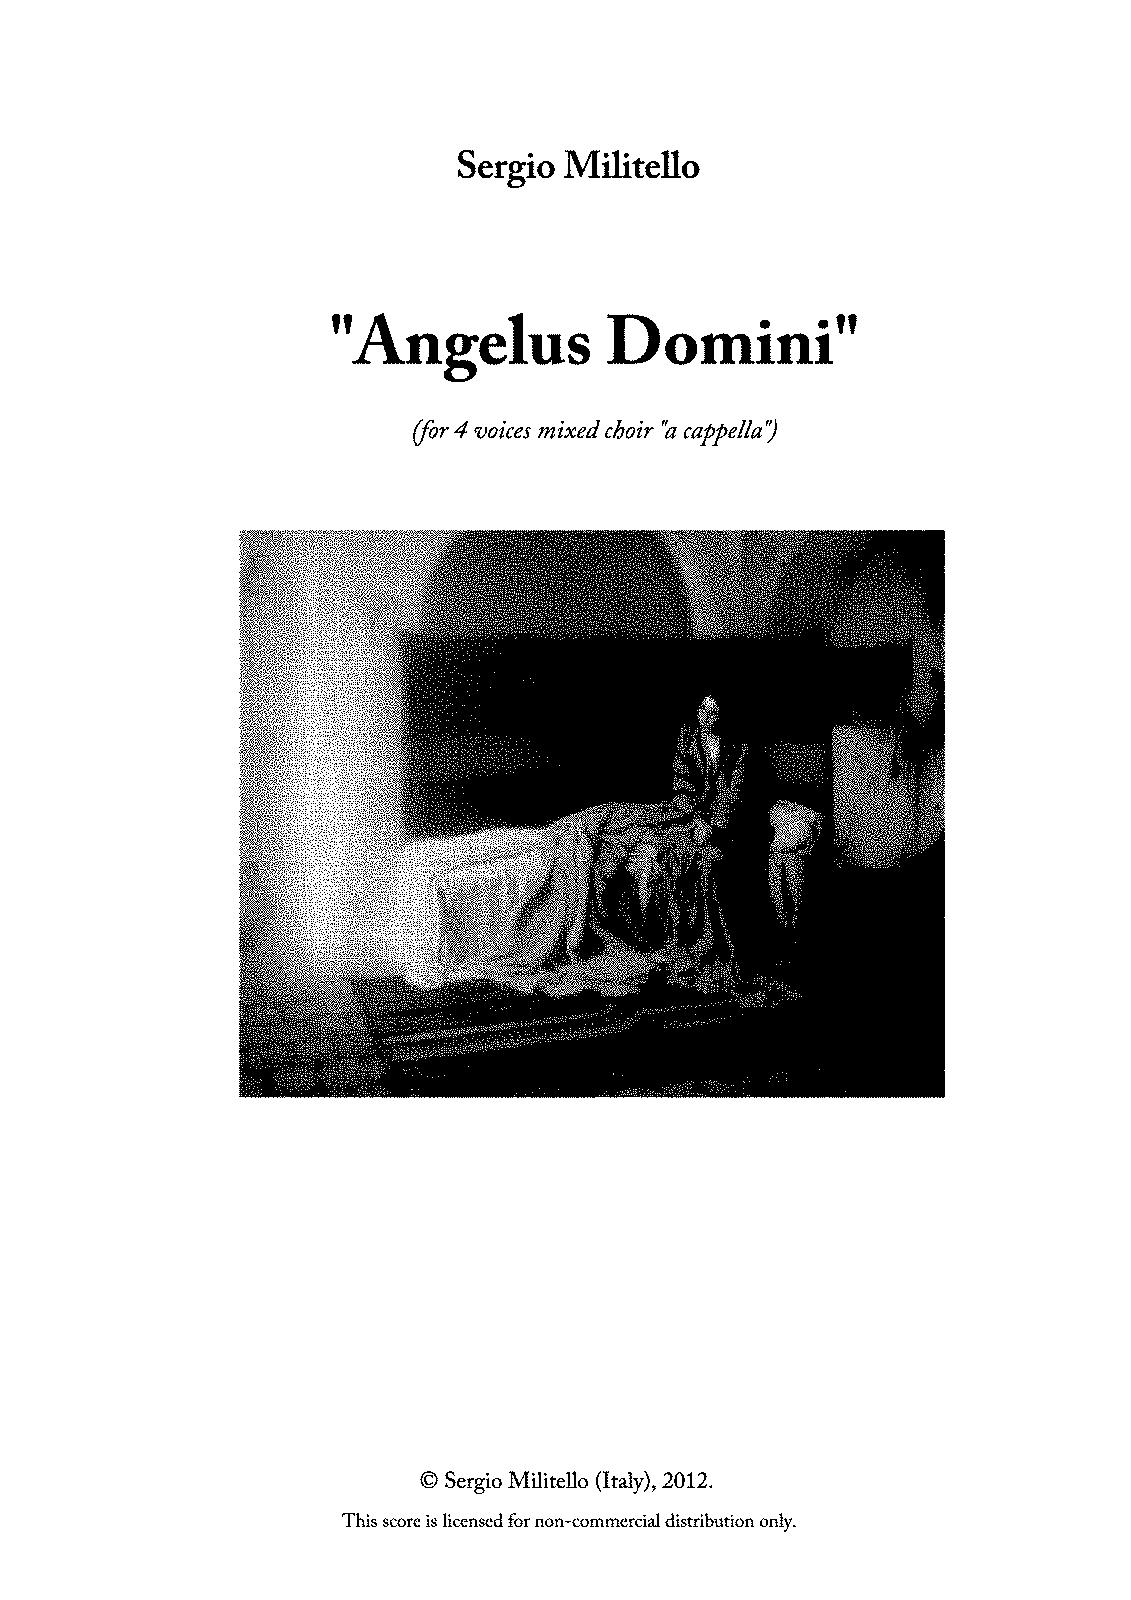 Angelus Domini (Militello, Sergio) - IMSLP/Petrucci Music